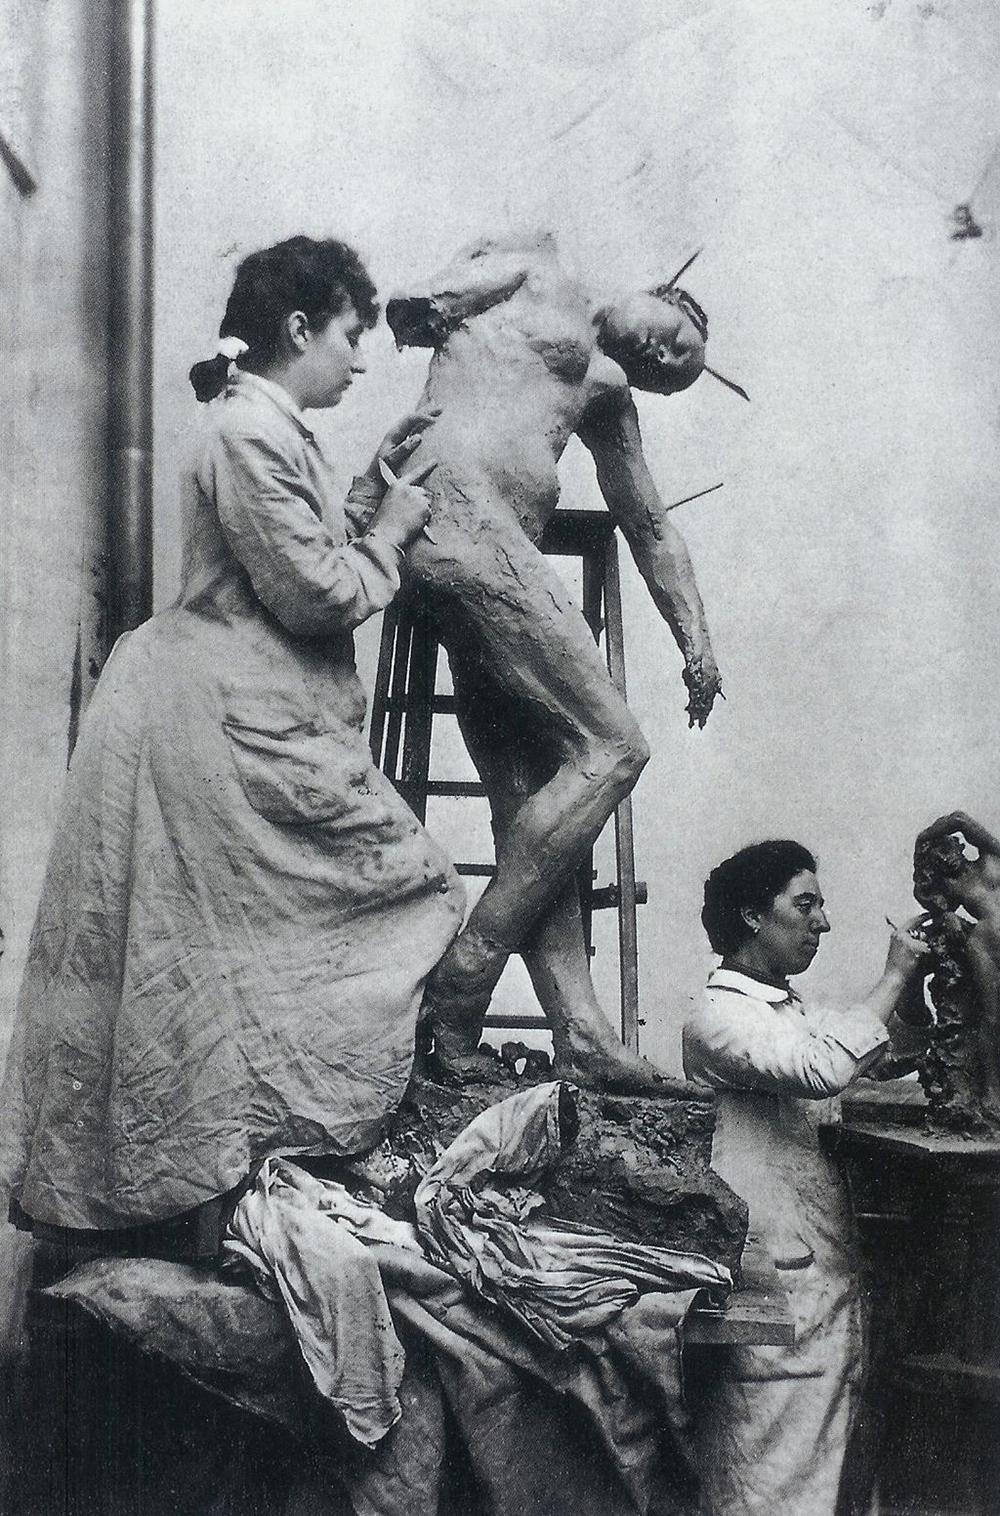 Camille Claudel (left) and Jessie Lipscomb, photographed by William Elborne, c. 1885.